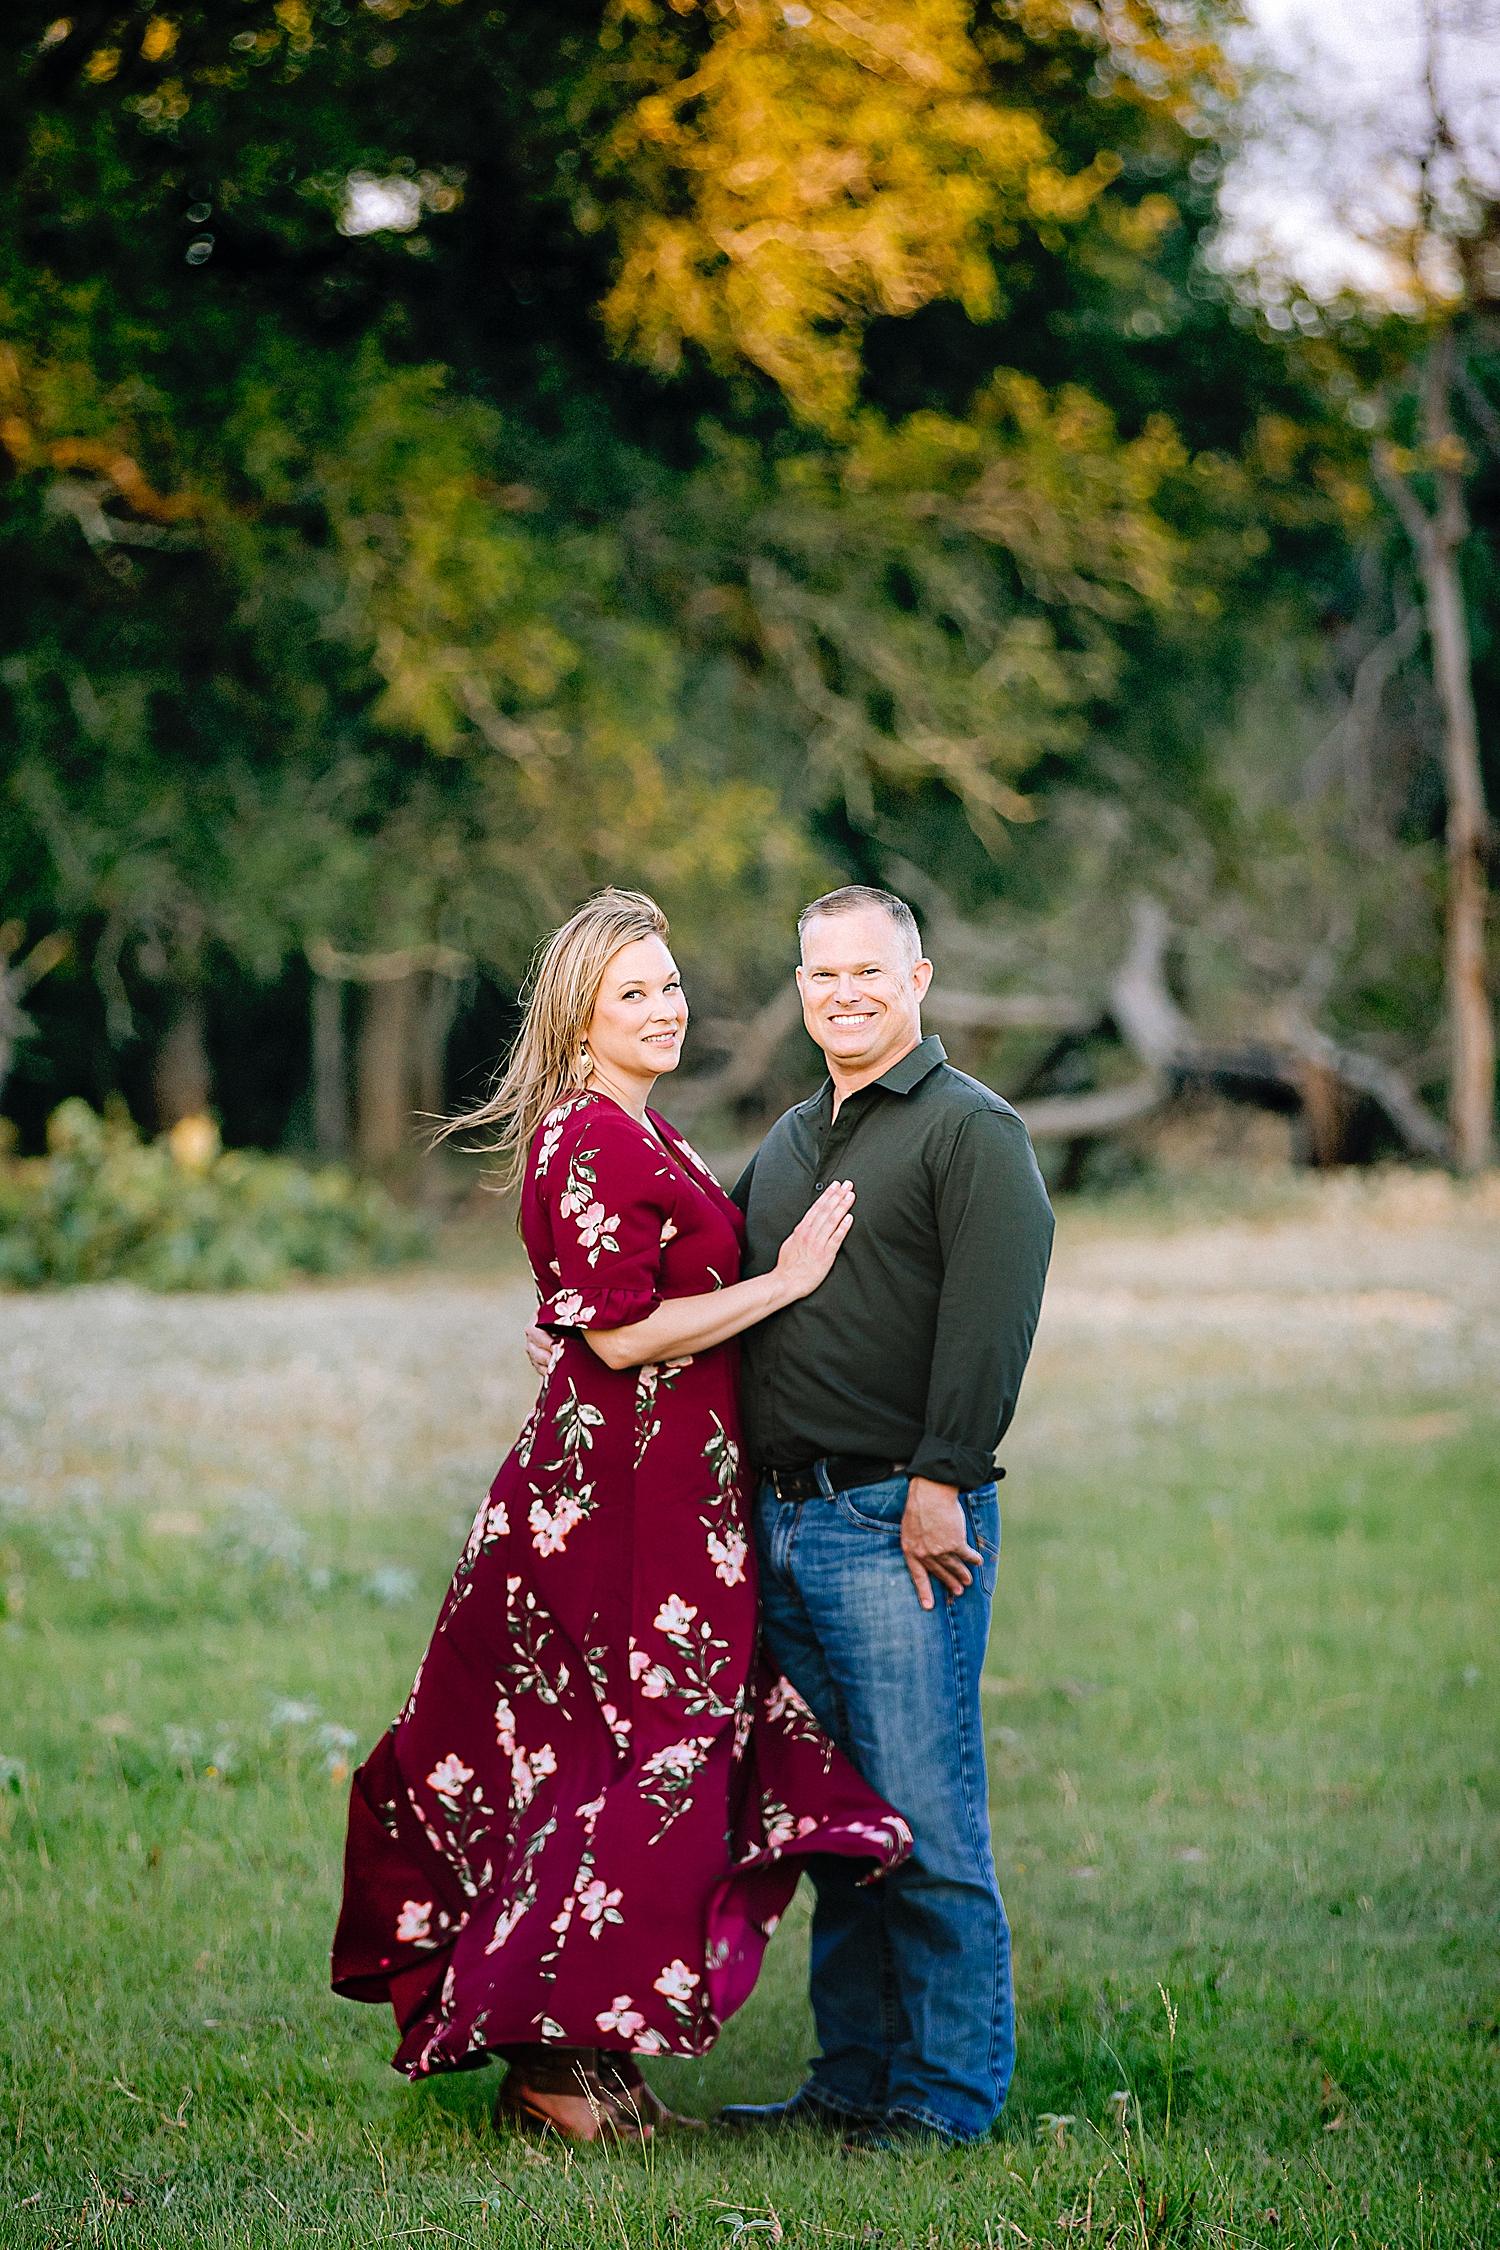 Carly-Barton-Photography-La-Vernia-Texas-Engagement-Photos-Sunset_0036.jpg